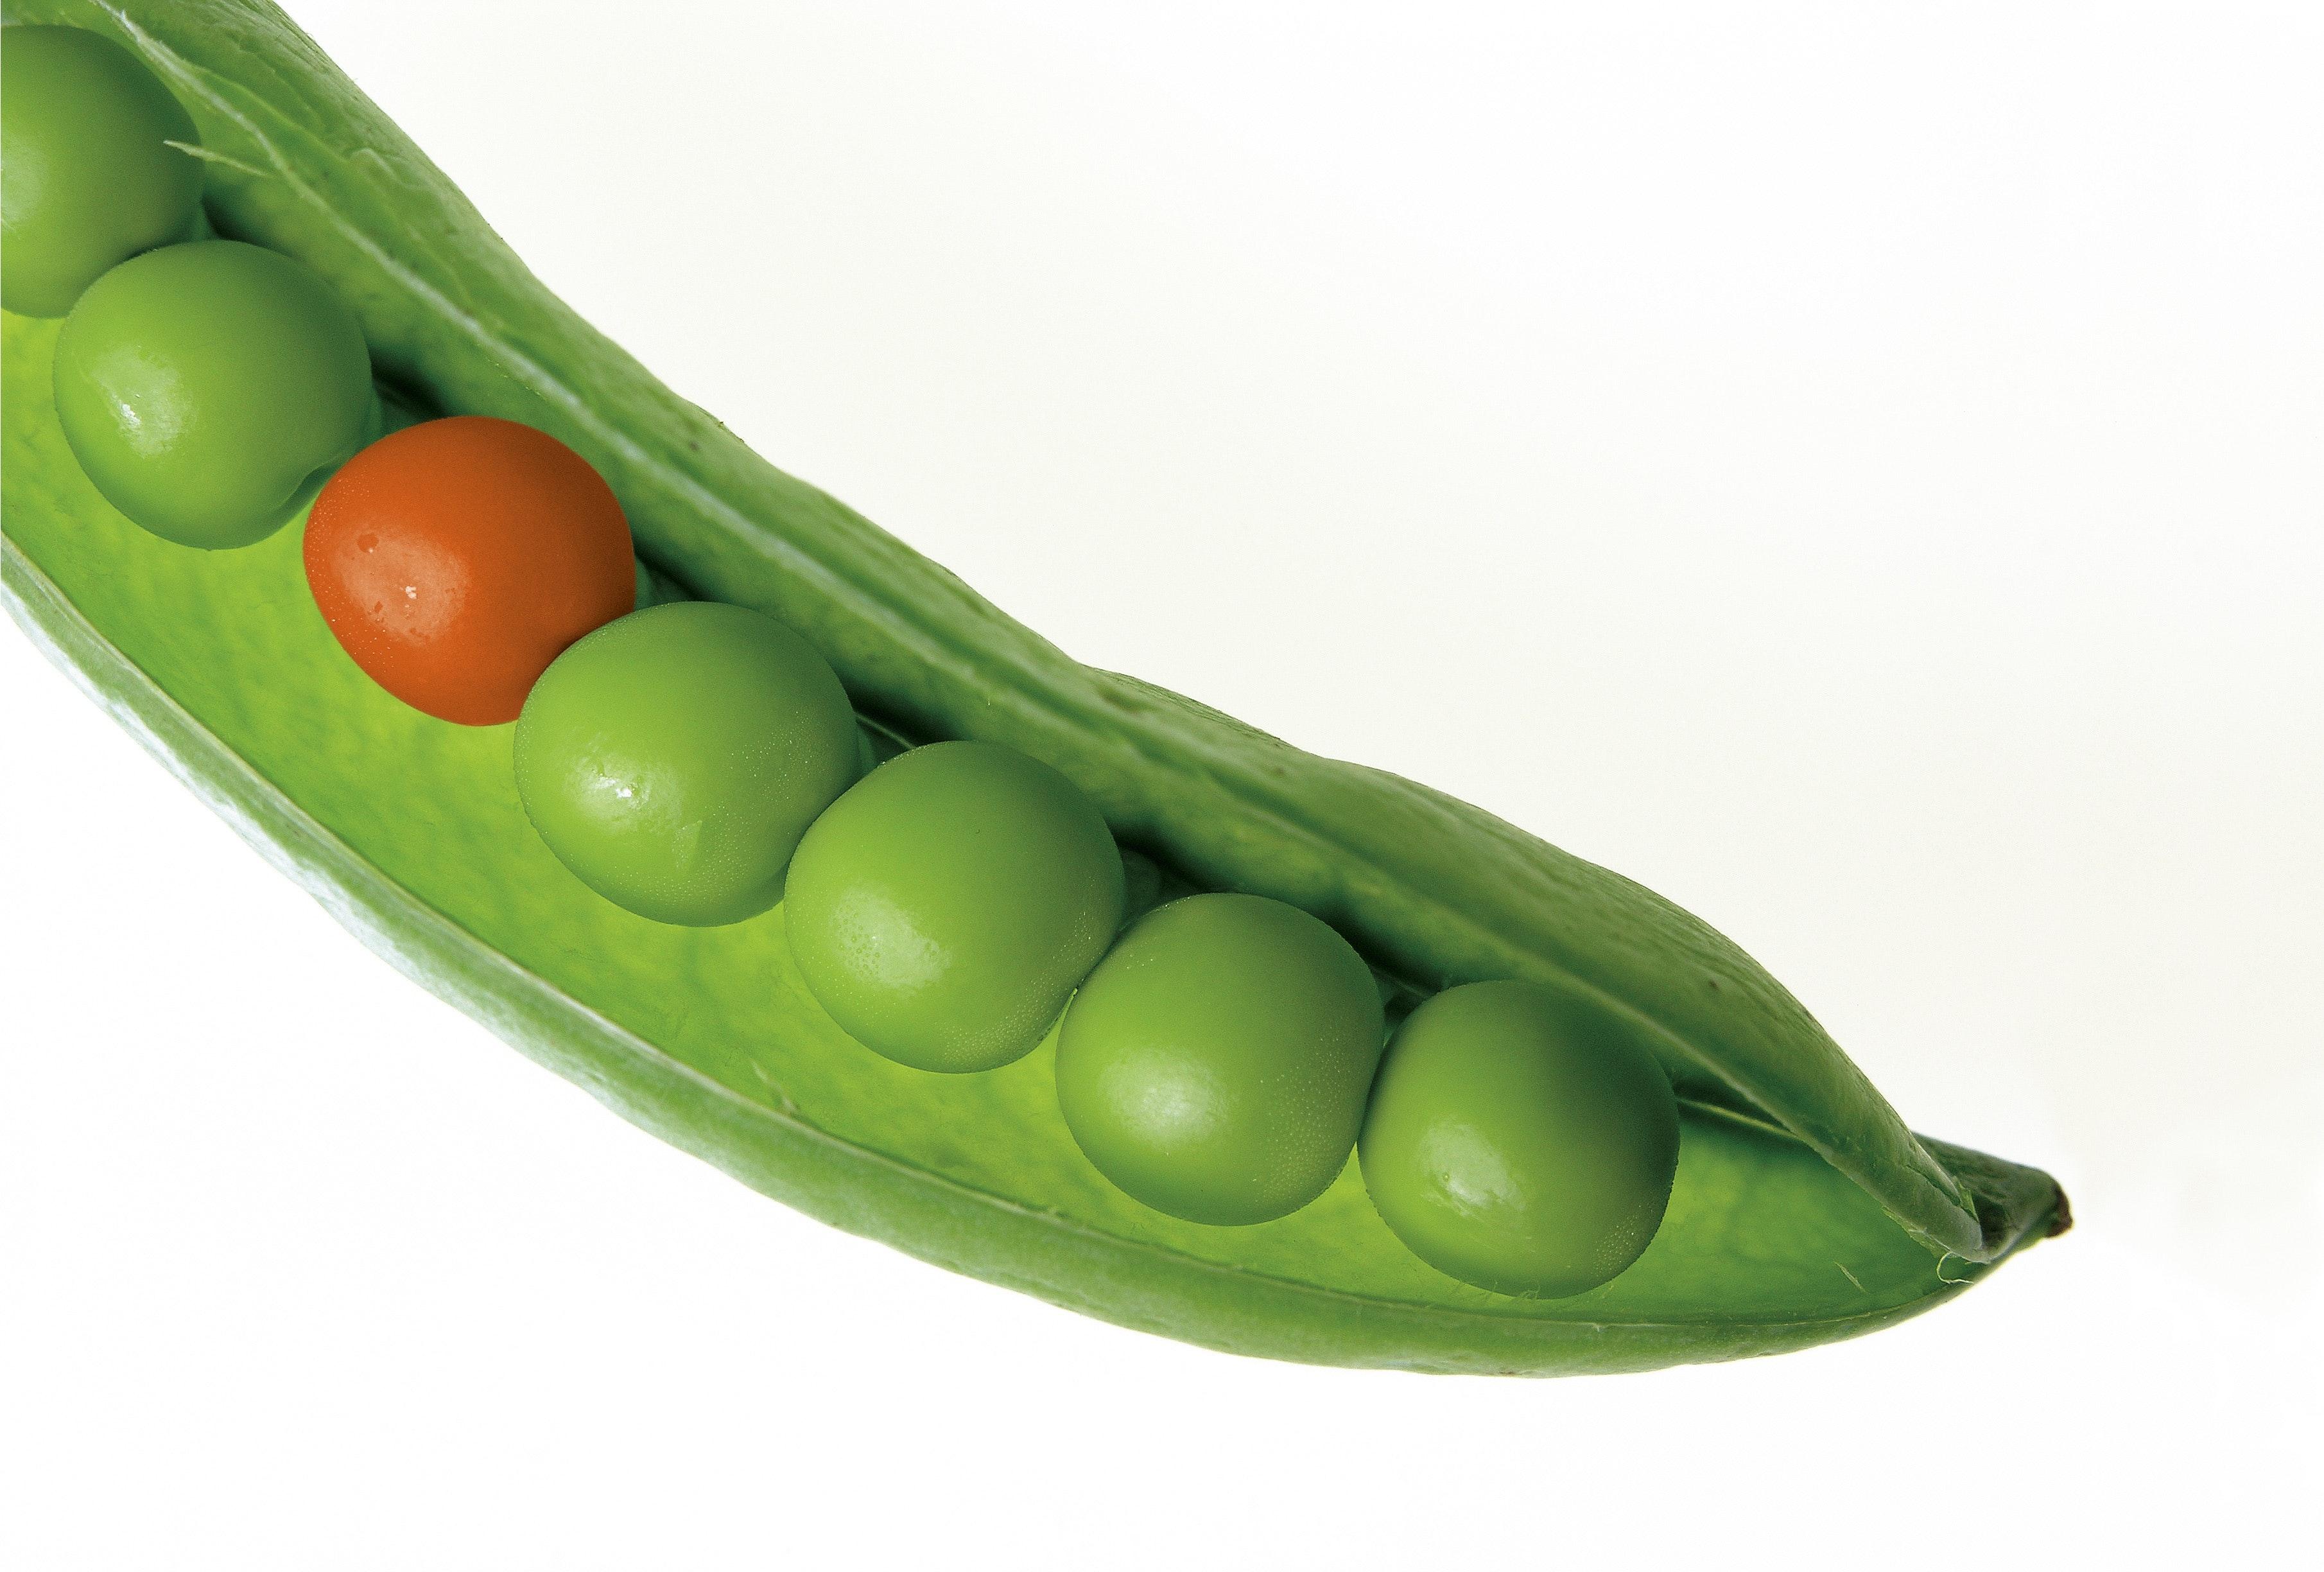 Close Up Photography Of Green Pea Pod Free Stock Photo